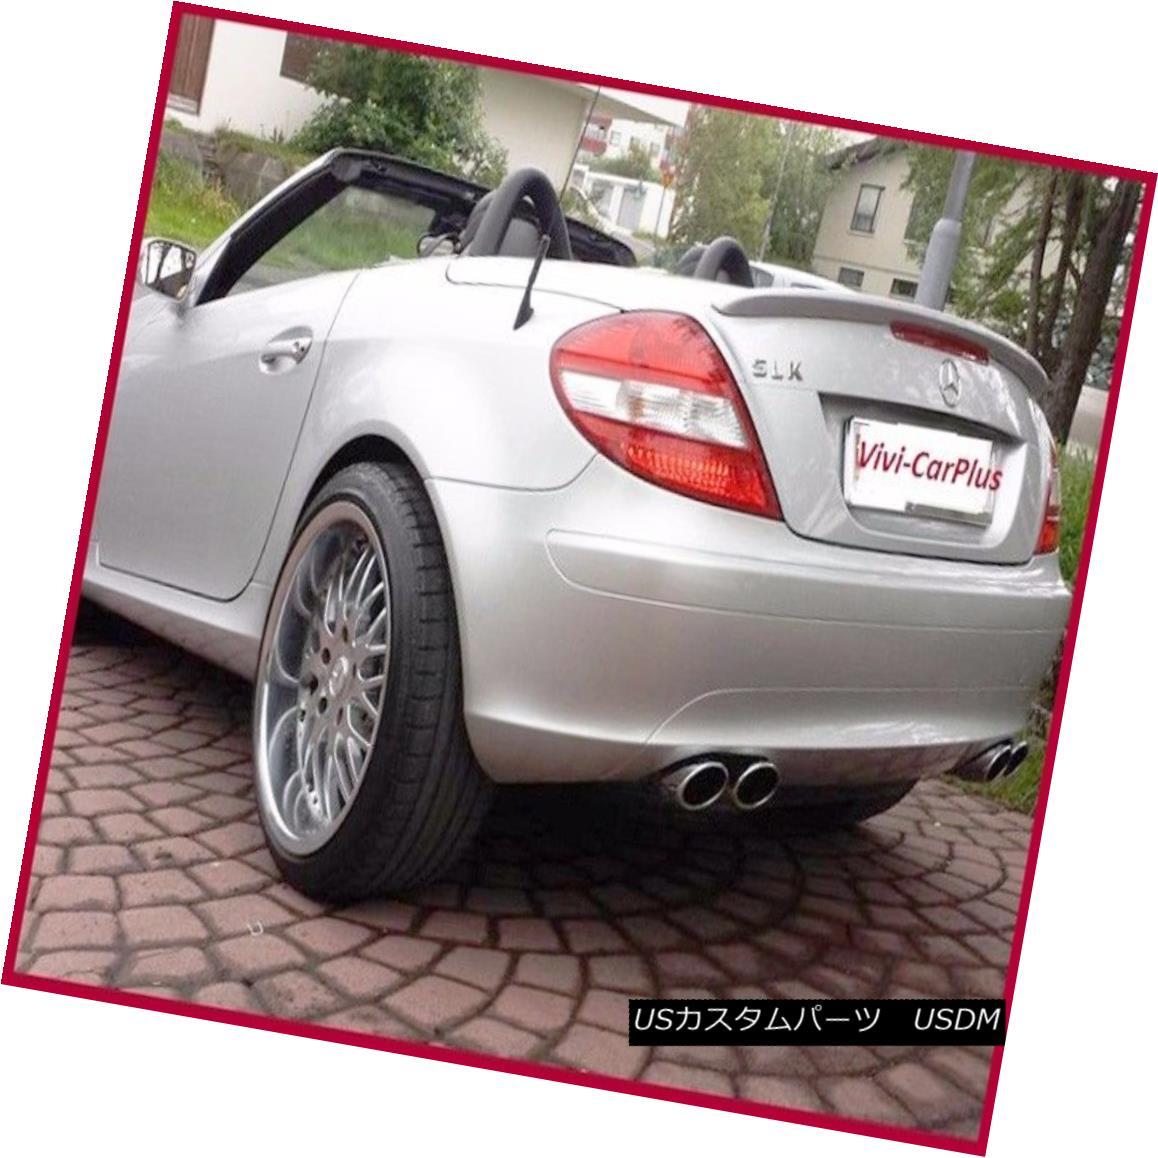 PAINTED A Type Trunk Rear Spoiler For 05-10 M-Benz R171 SLK280 SLK300 SLK55AMG